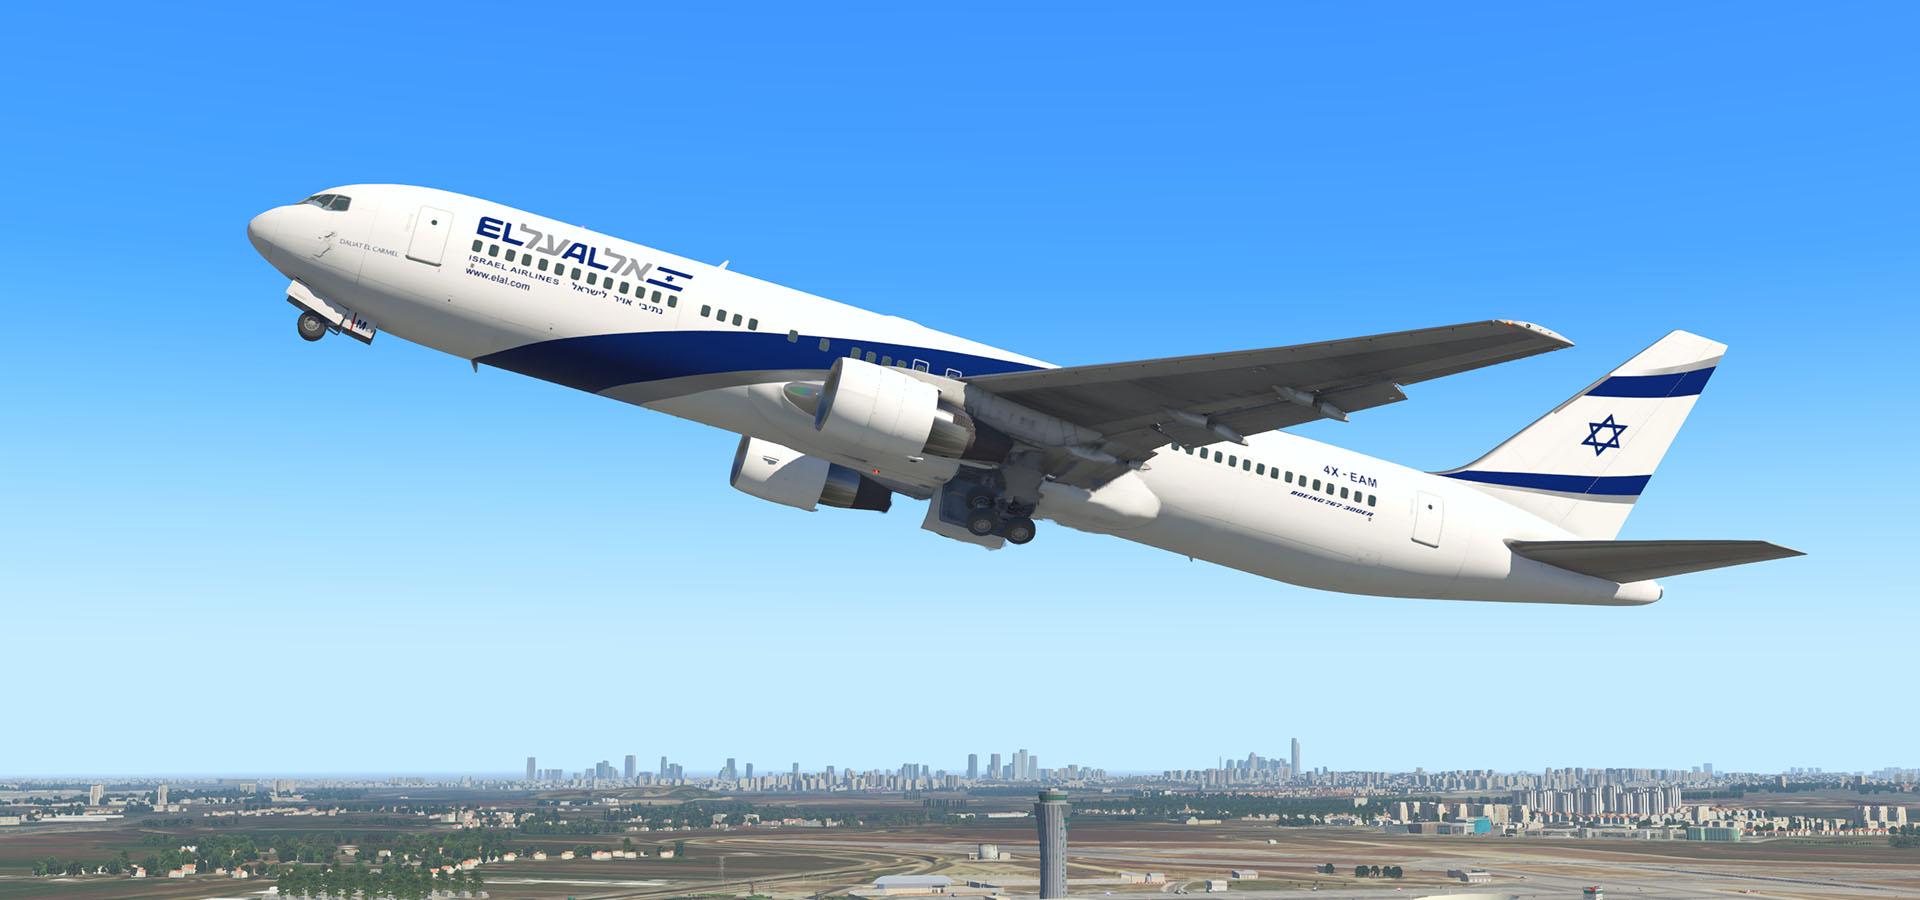 El Al Israel Airlines Circa 2017 Boeing 767-3Q8(ER) 4X-EAM